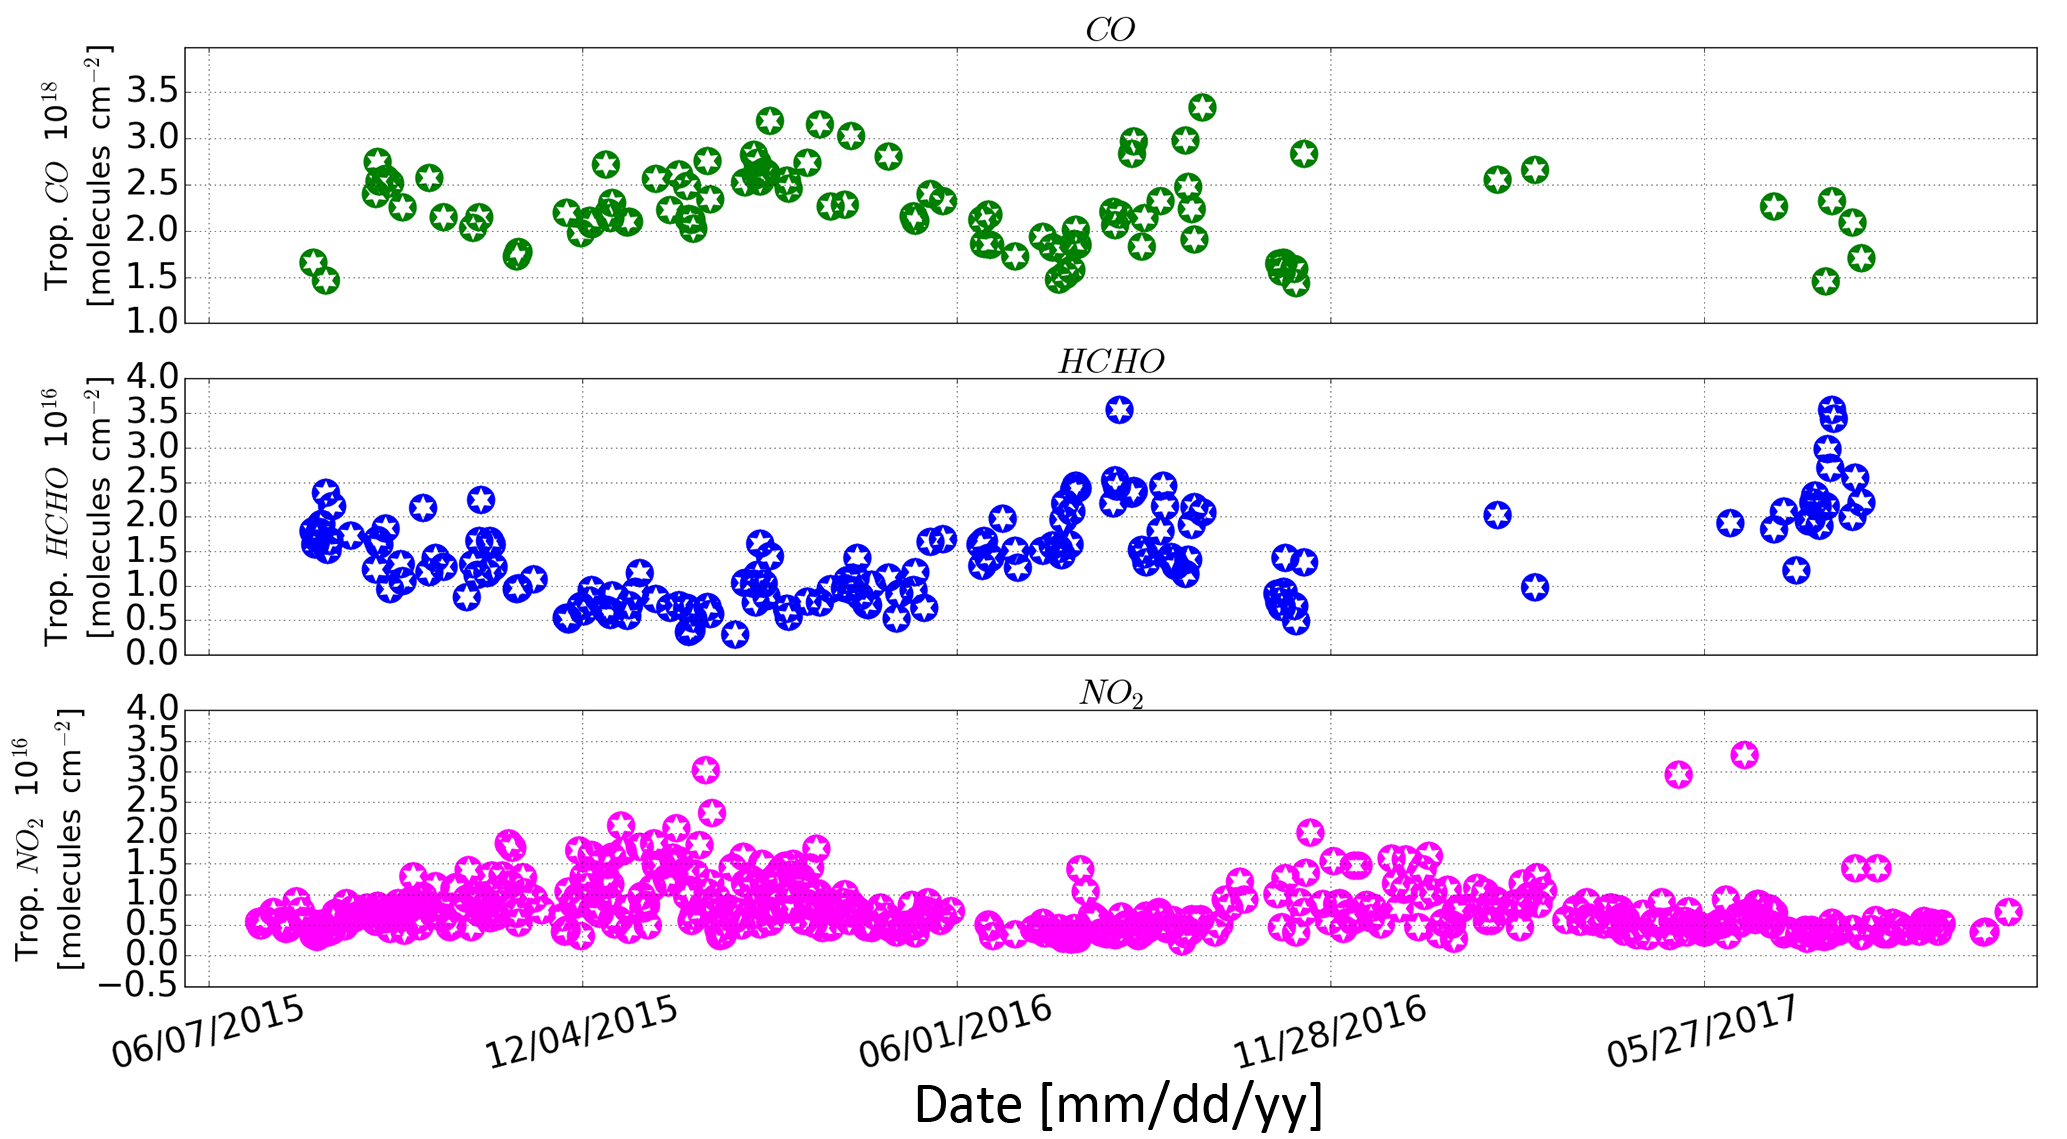 ACP - Ozone seasonal evolution and photochemical production regime